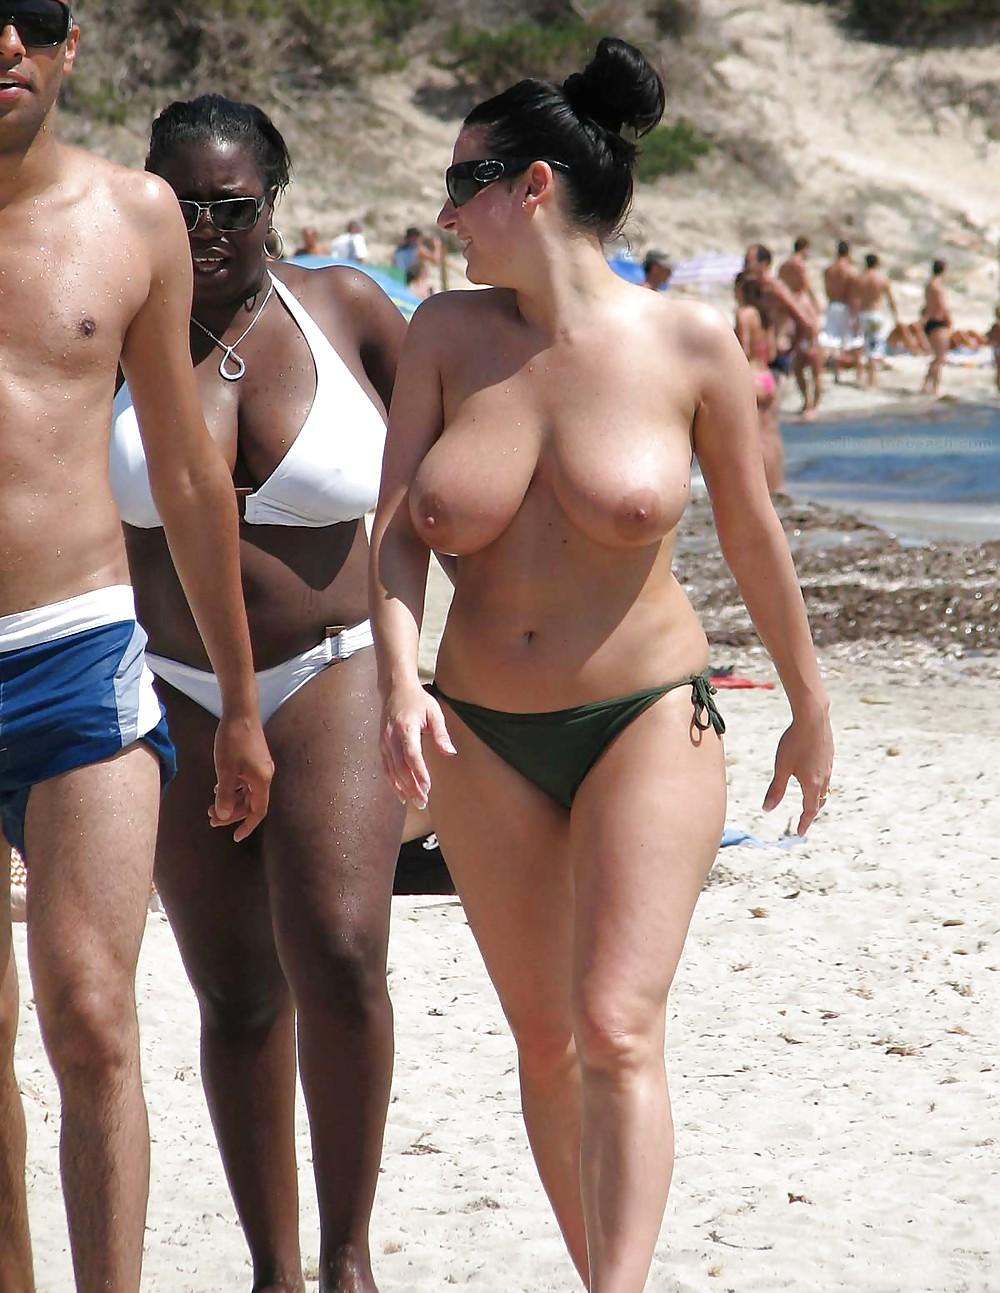 Perfect boobs big tits nude beach